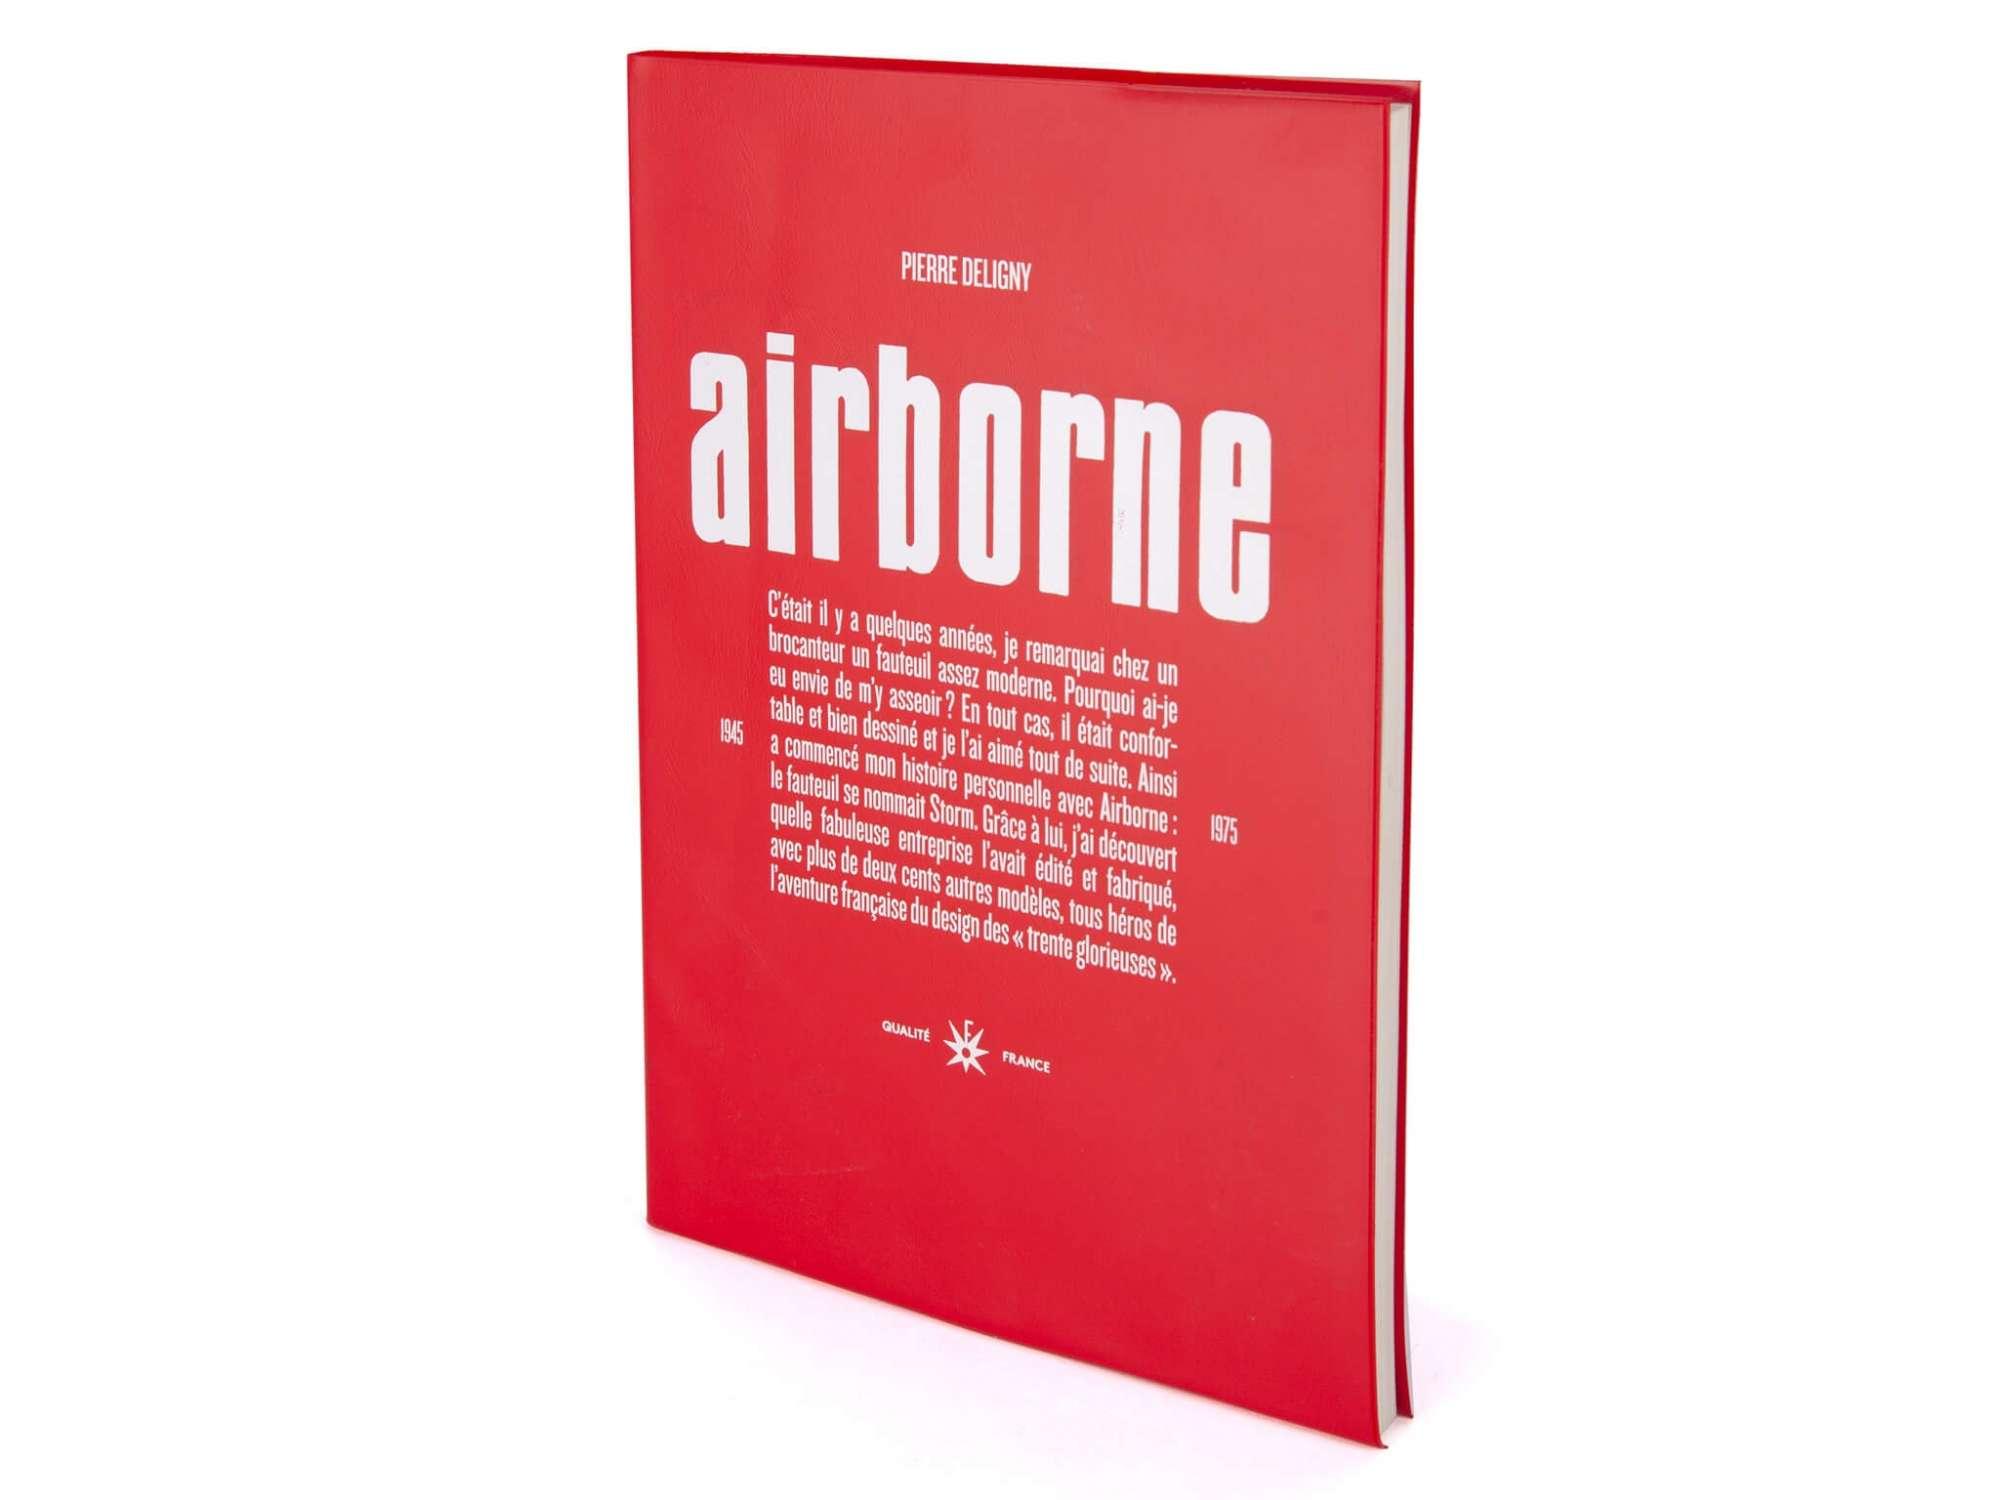 Airborne - Pierre Deligny